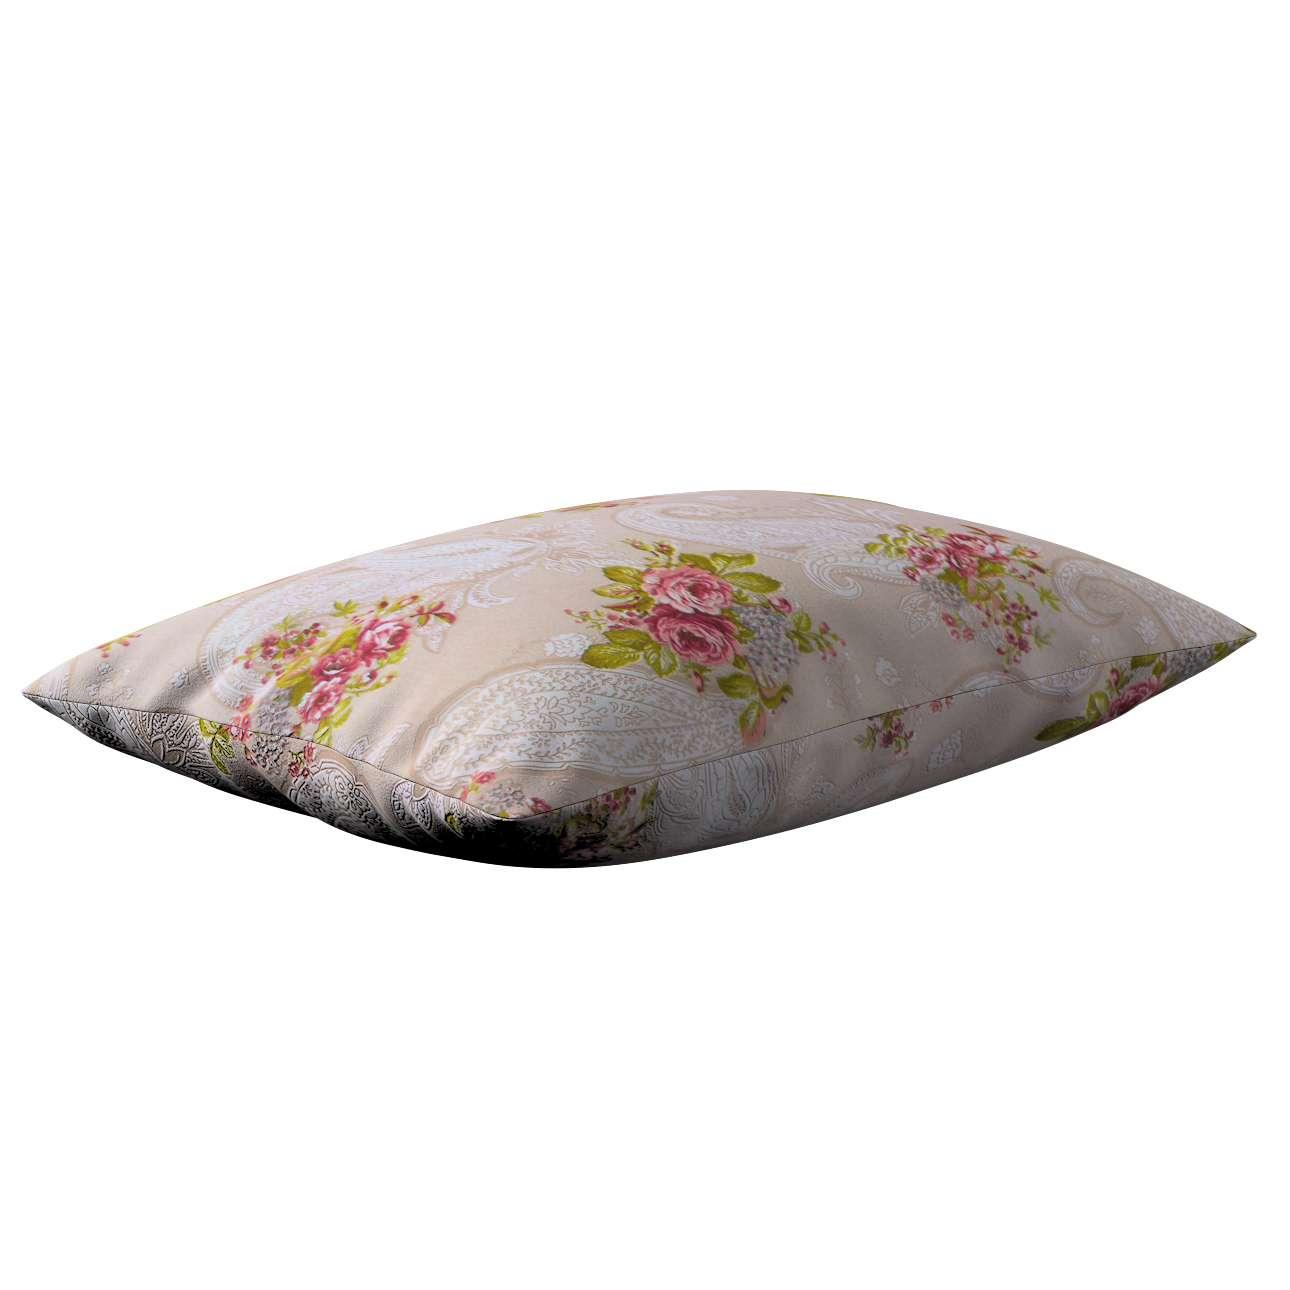 Kissenhülle Kinga 60x40cm 60x40cm von der Kollektion Flowers/Luna, Stoff: 311-15